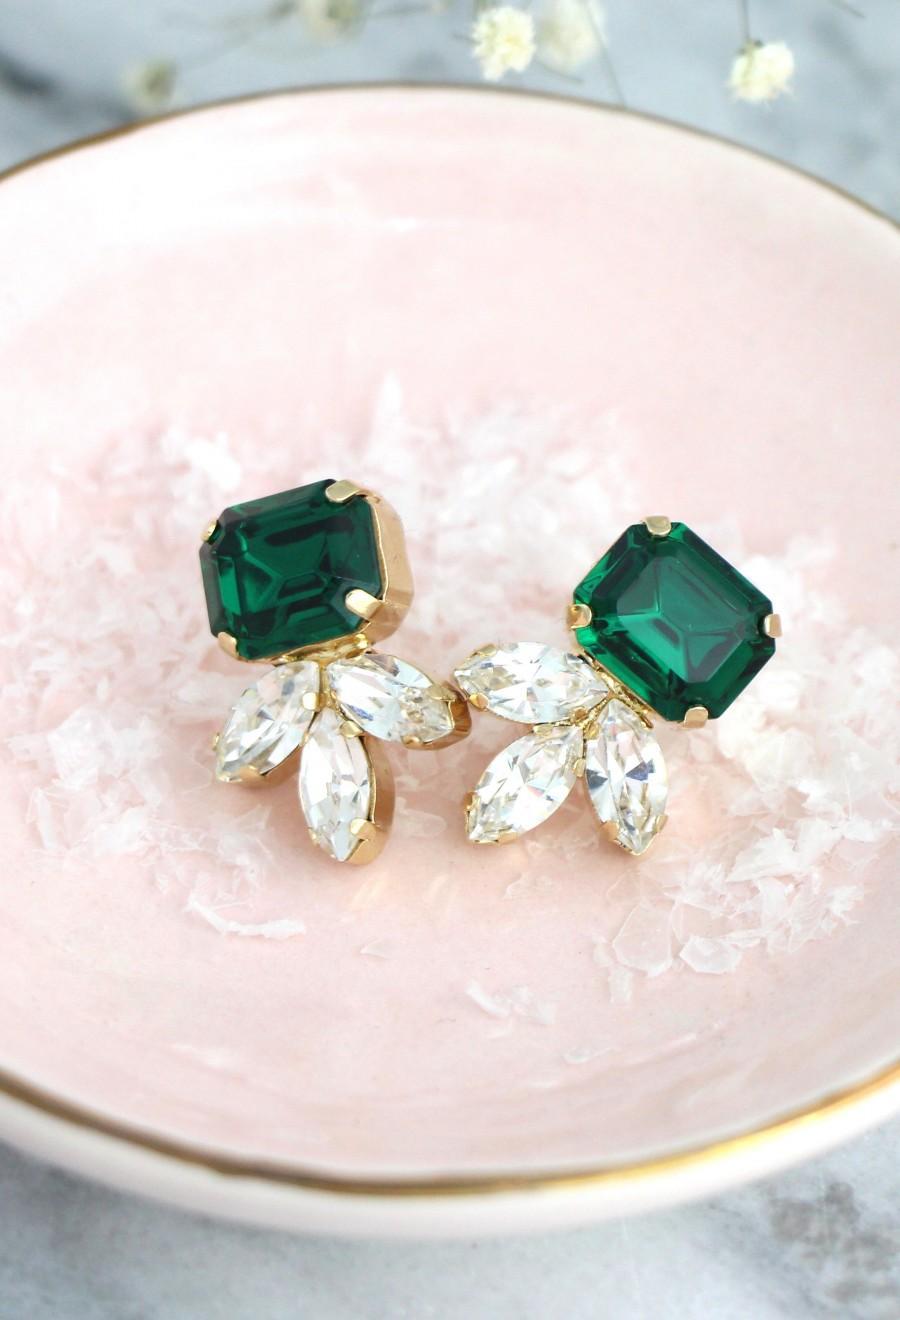 Hochzeit - Emerald Earrings, Bridal Emerald Earrings, Dark Green Bridal Stud Earrings, Bridesmaids Emerald Earrings, Green Bridal Swarovski Earrings